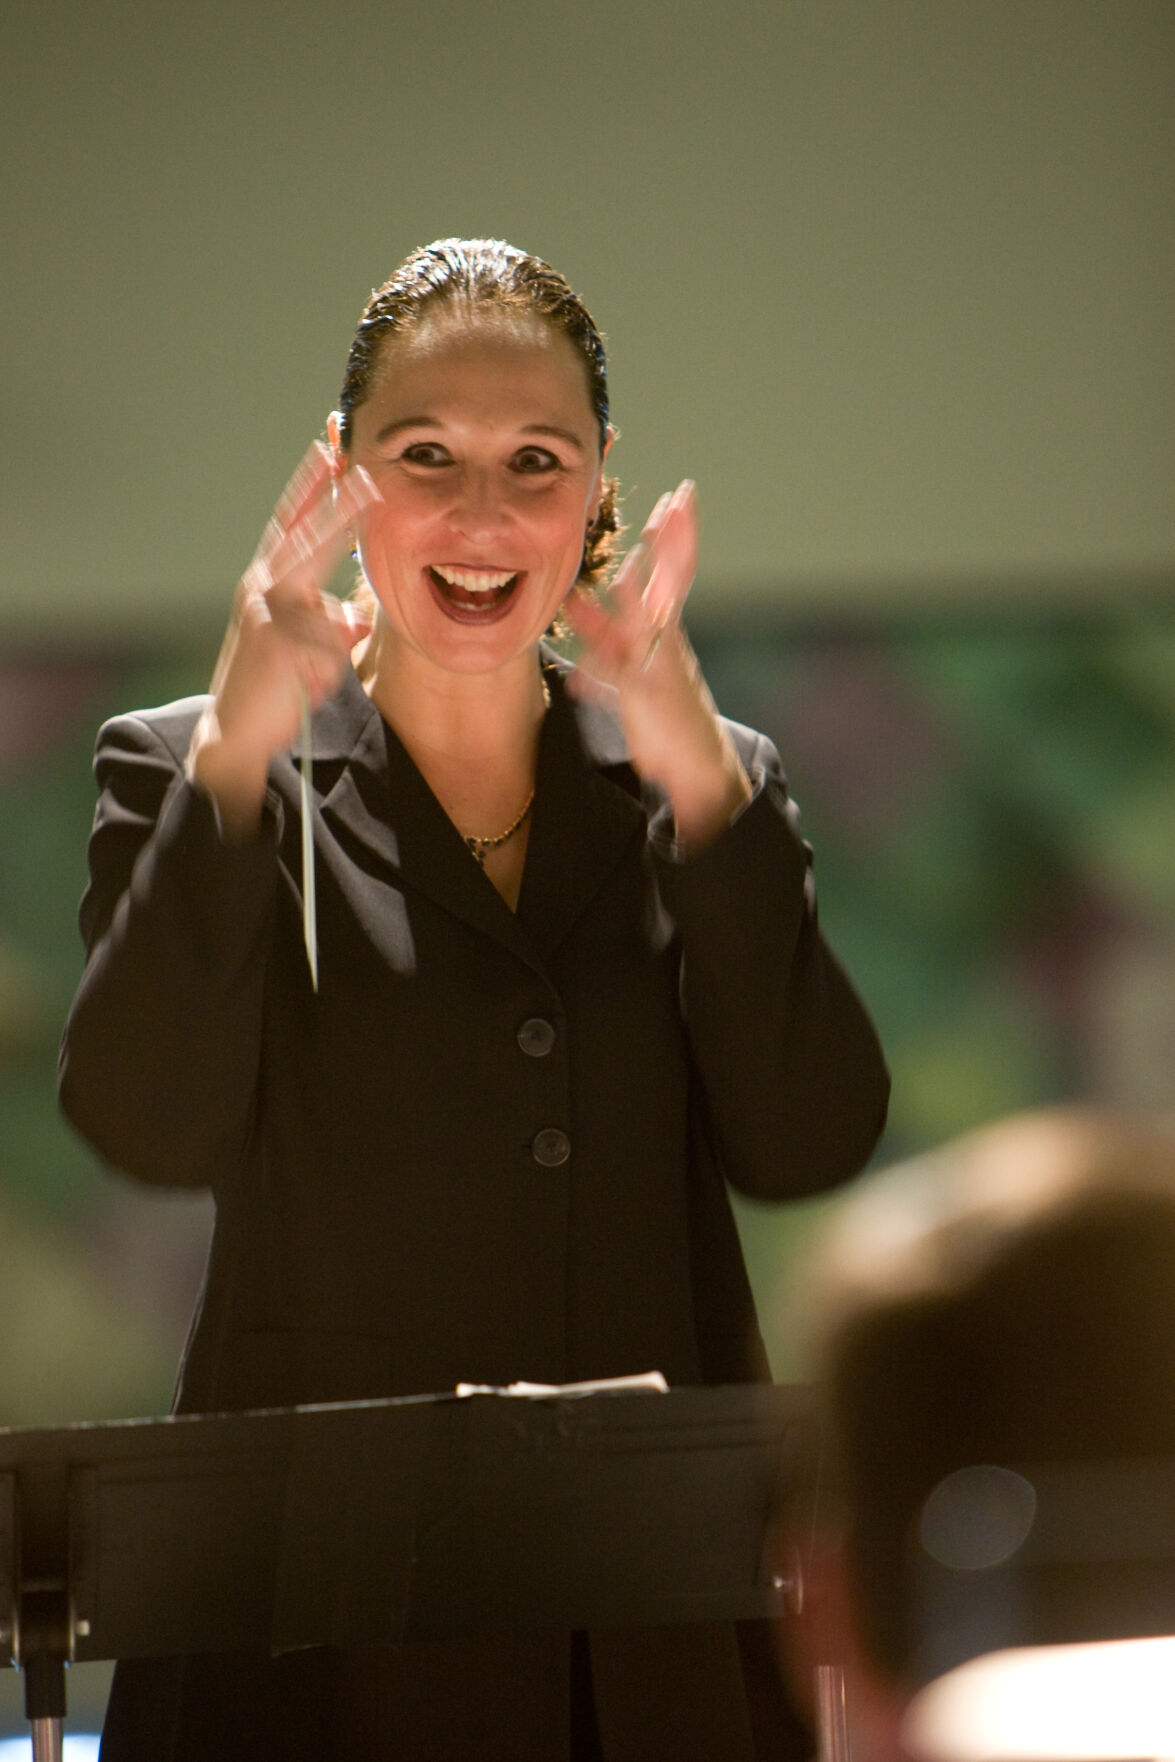 Music Director Cornelia Laemmli Orth